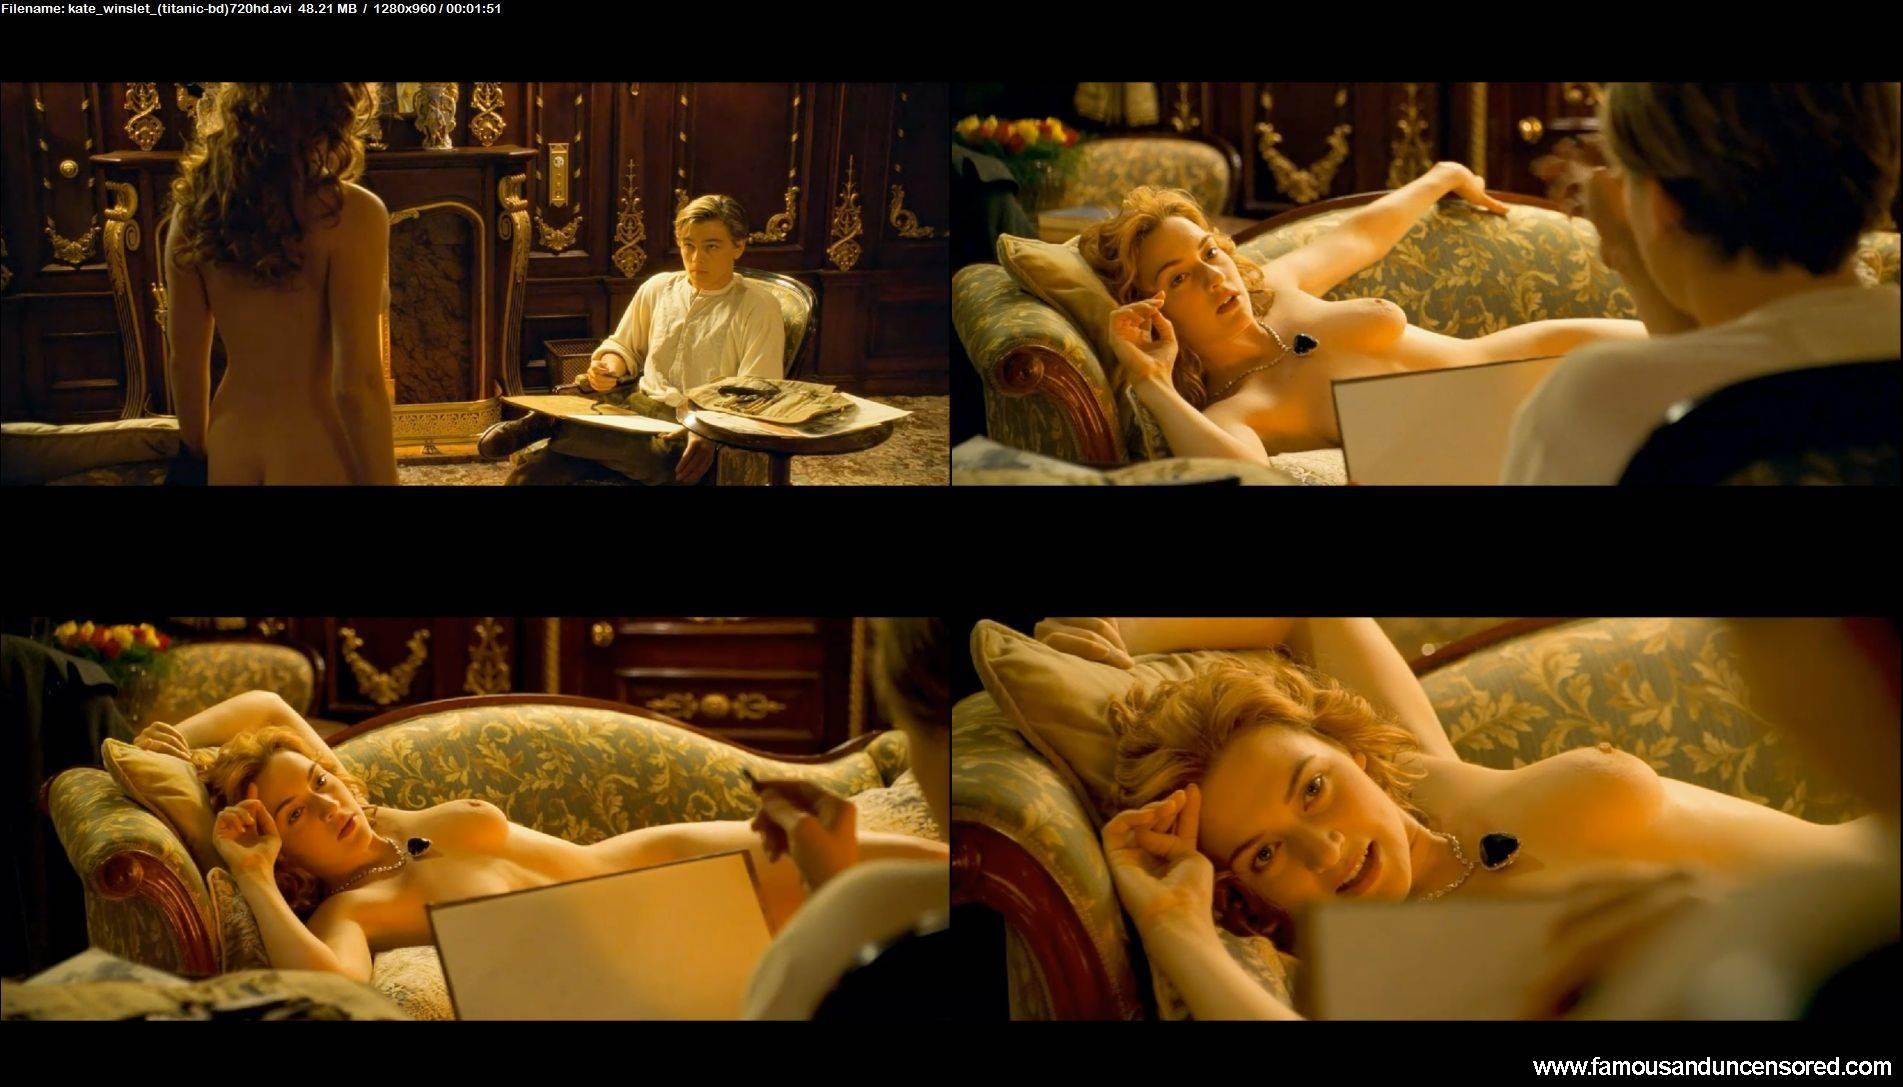 naked-titanic-movie-sex-scene-volleyball-naked-black